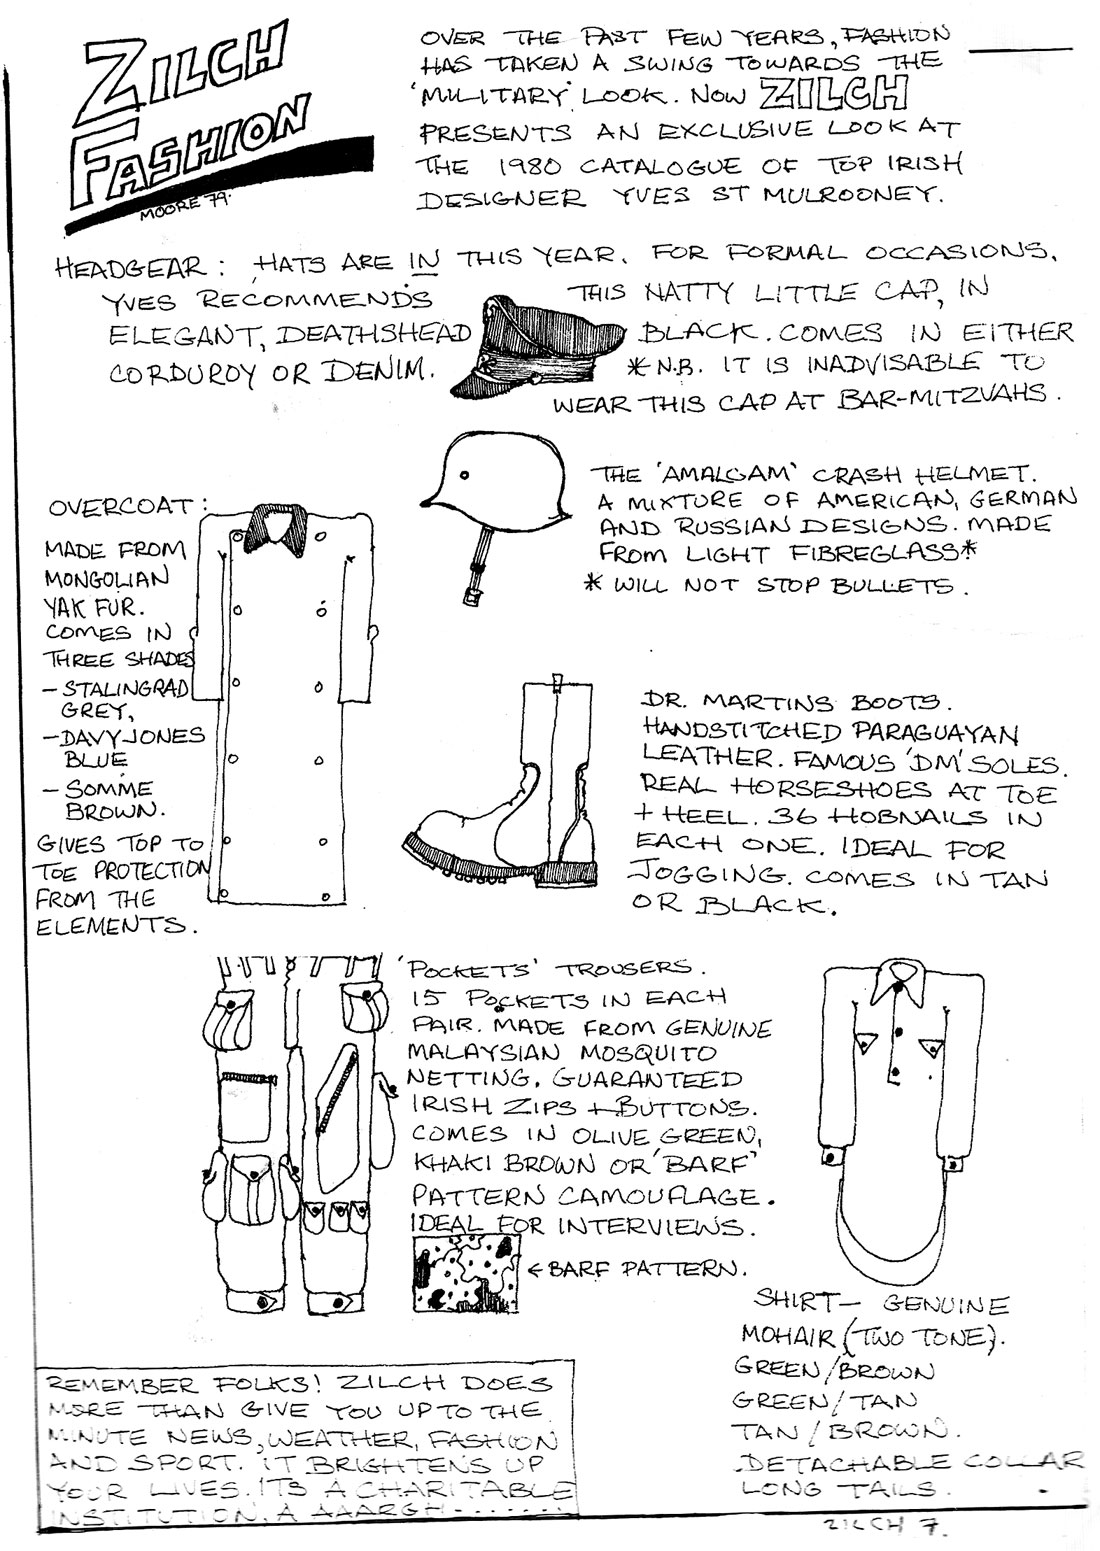 zilch comic 1980 fashion page